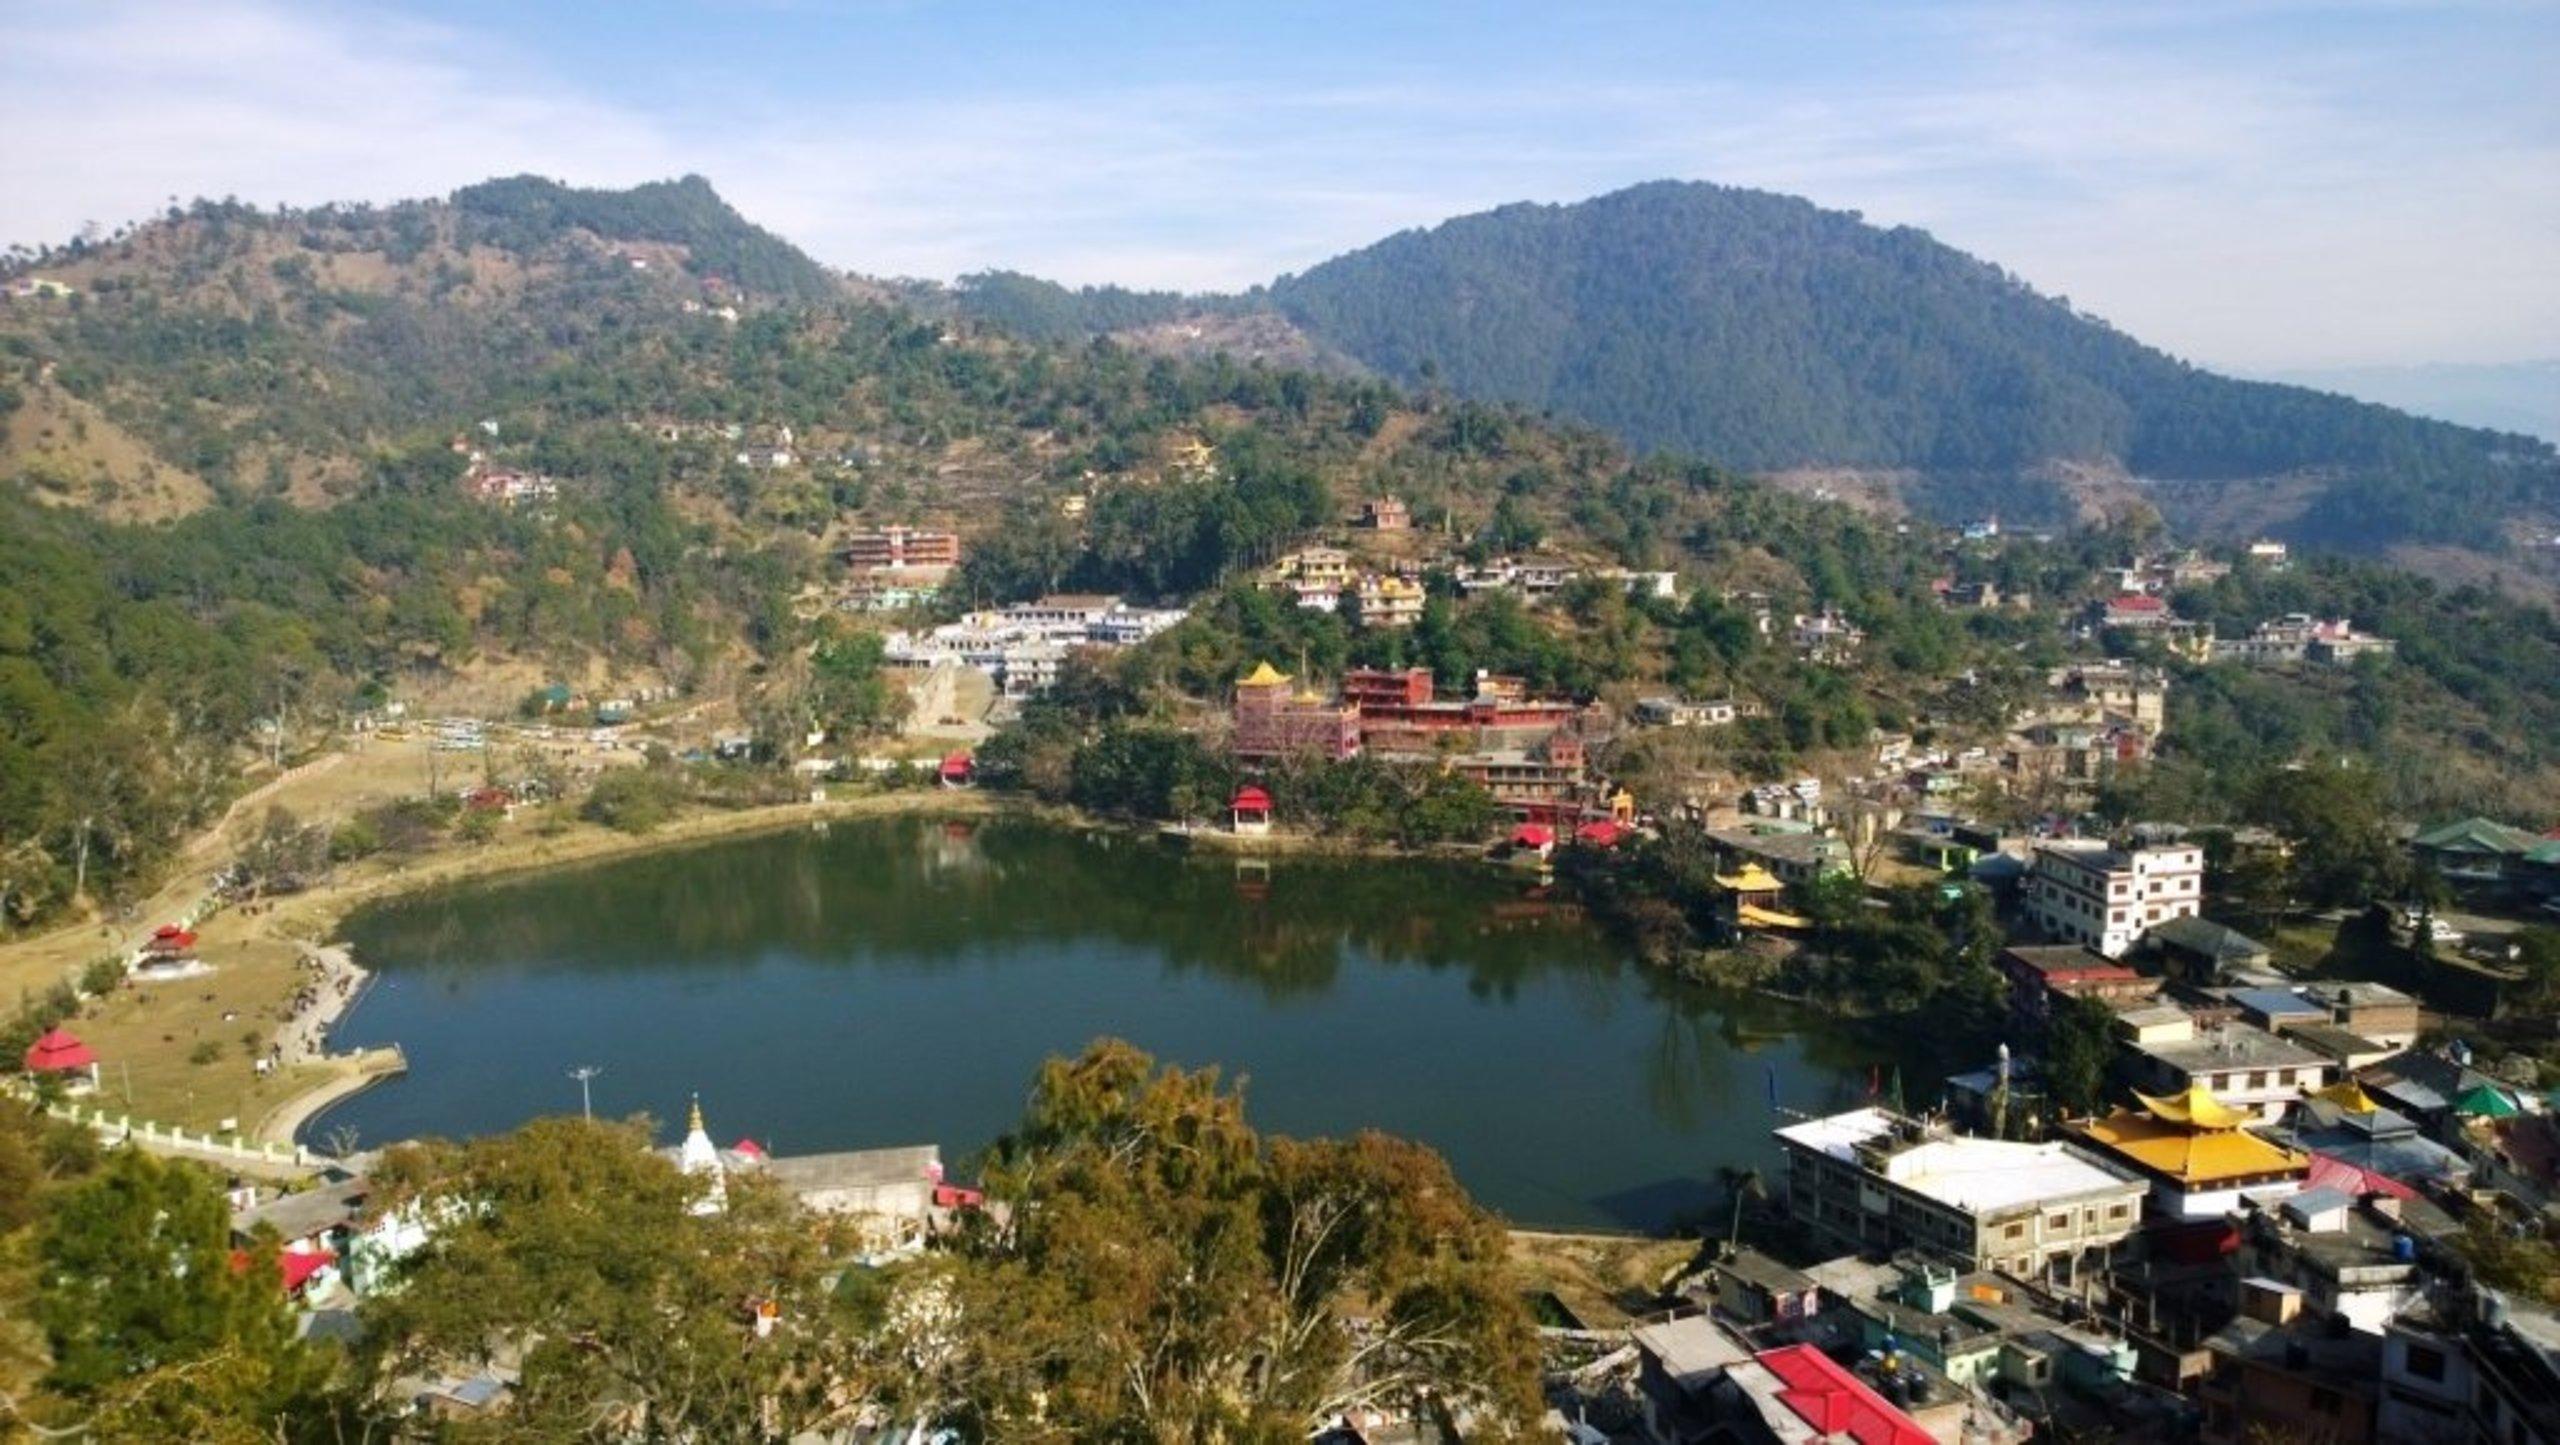 Rewalsar Tourism (2021): Best of Rewalsar, India - Tripadvisor